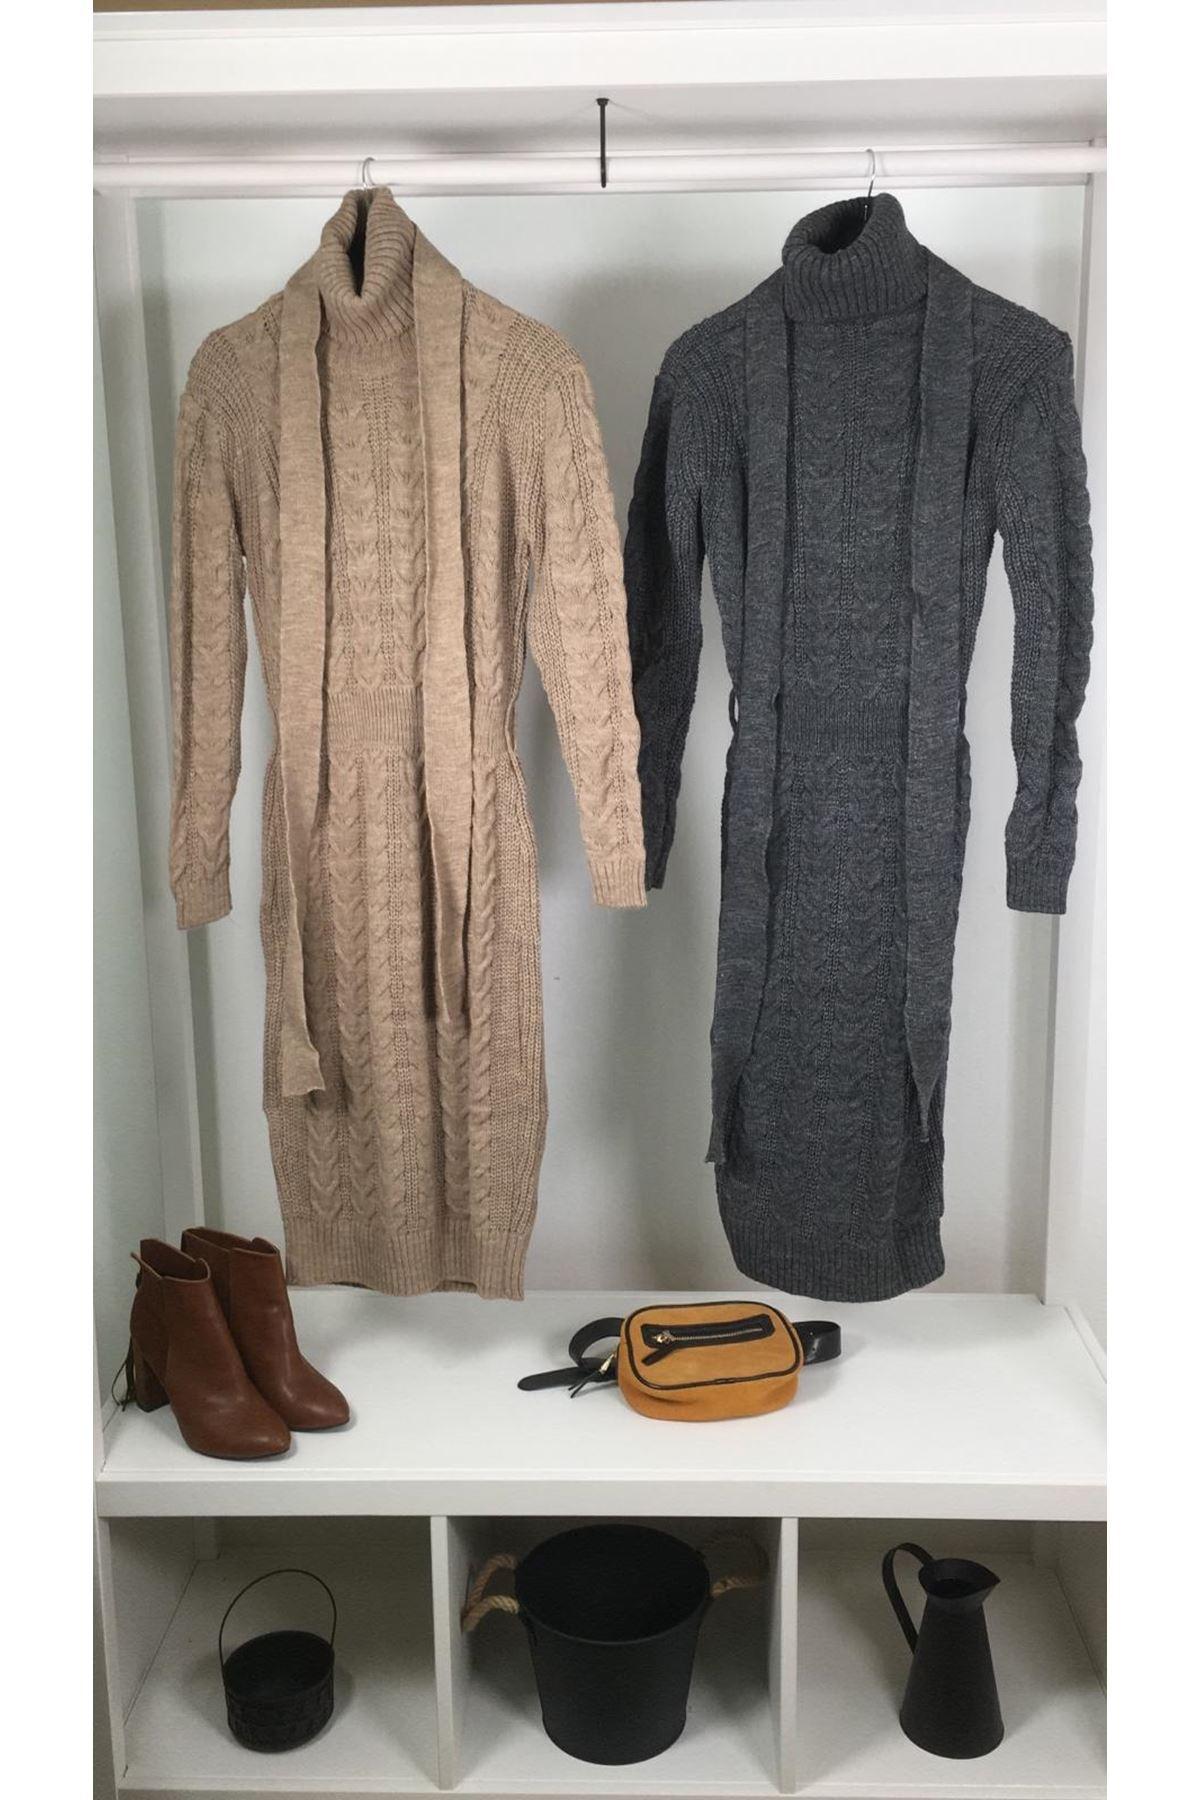 Boğazlı triko kemer elbise K10 VİZON